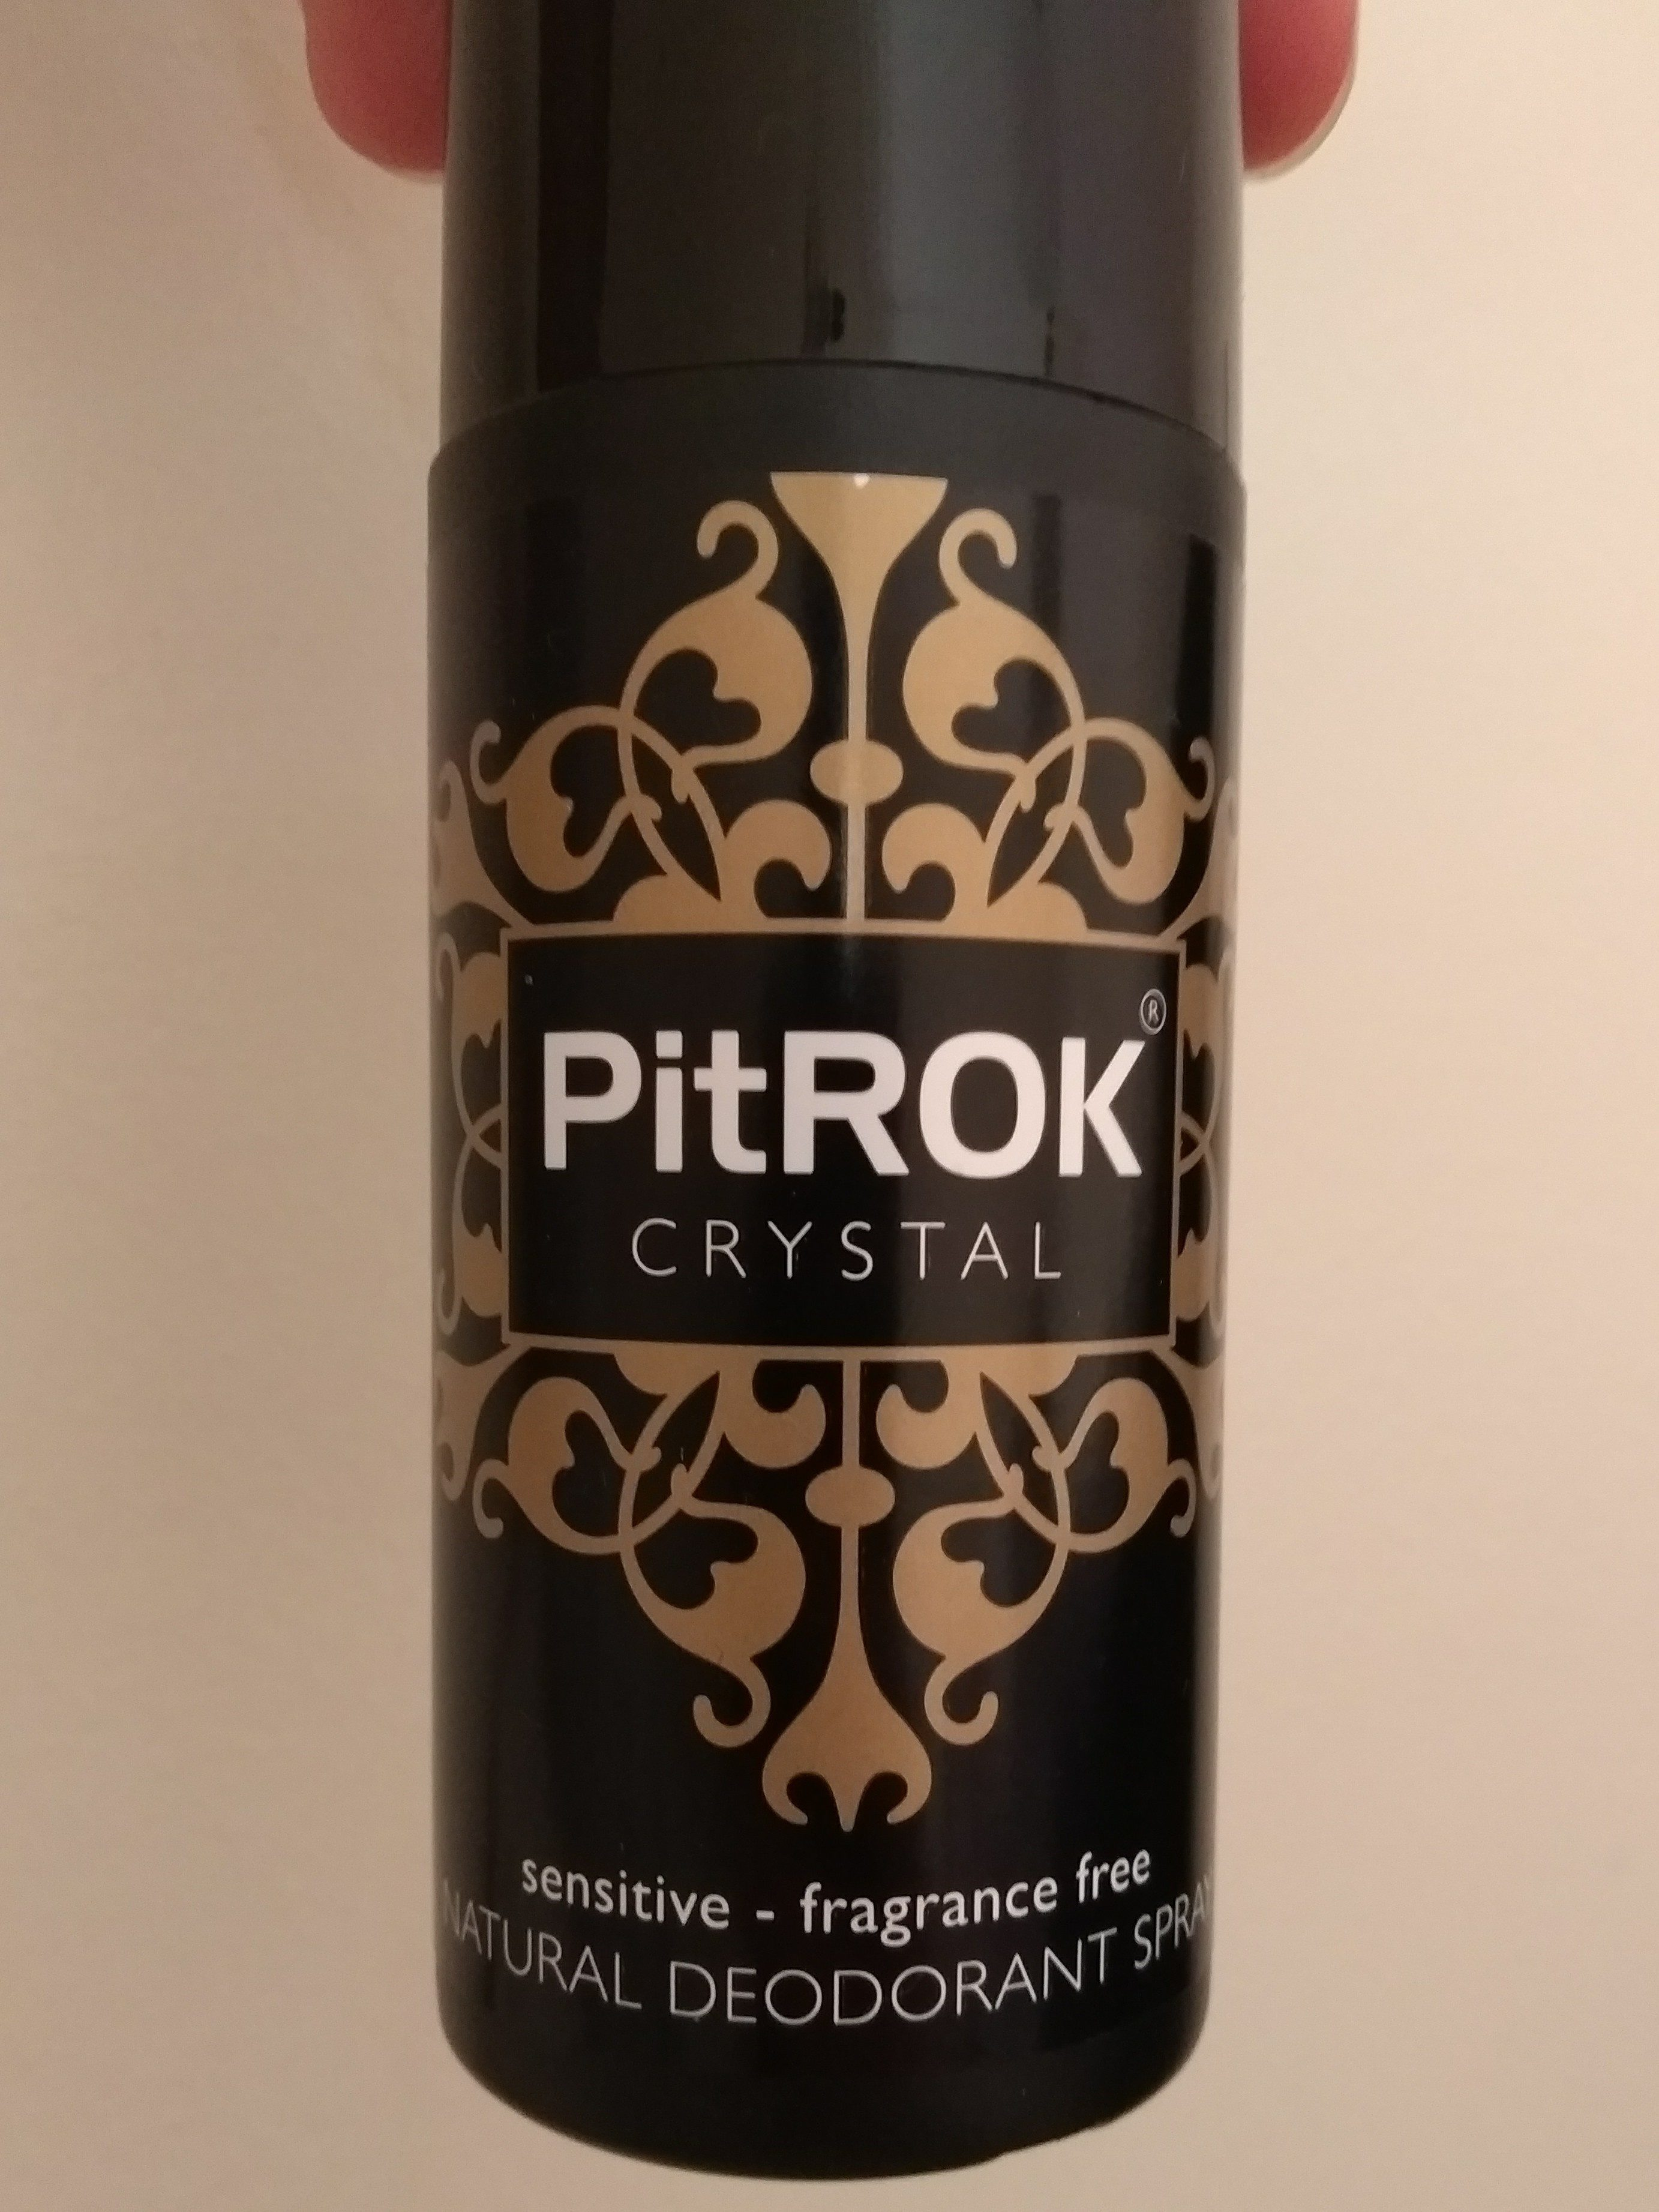 PitROK Crystal - Product